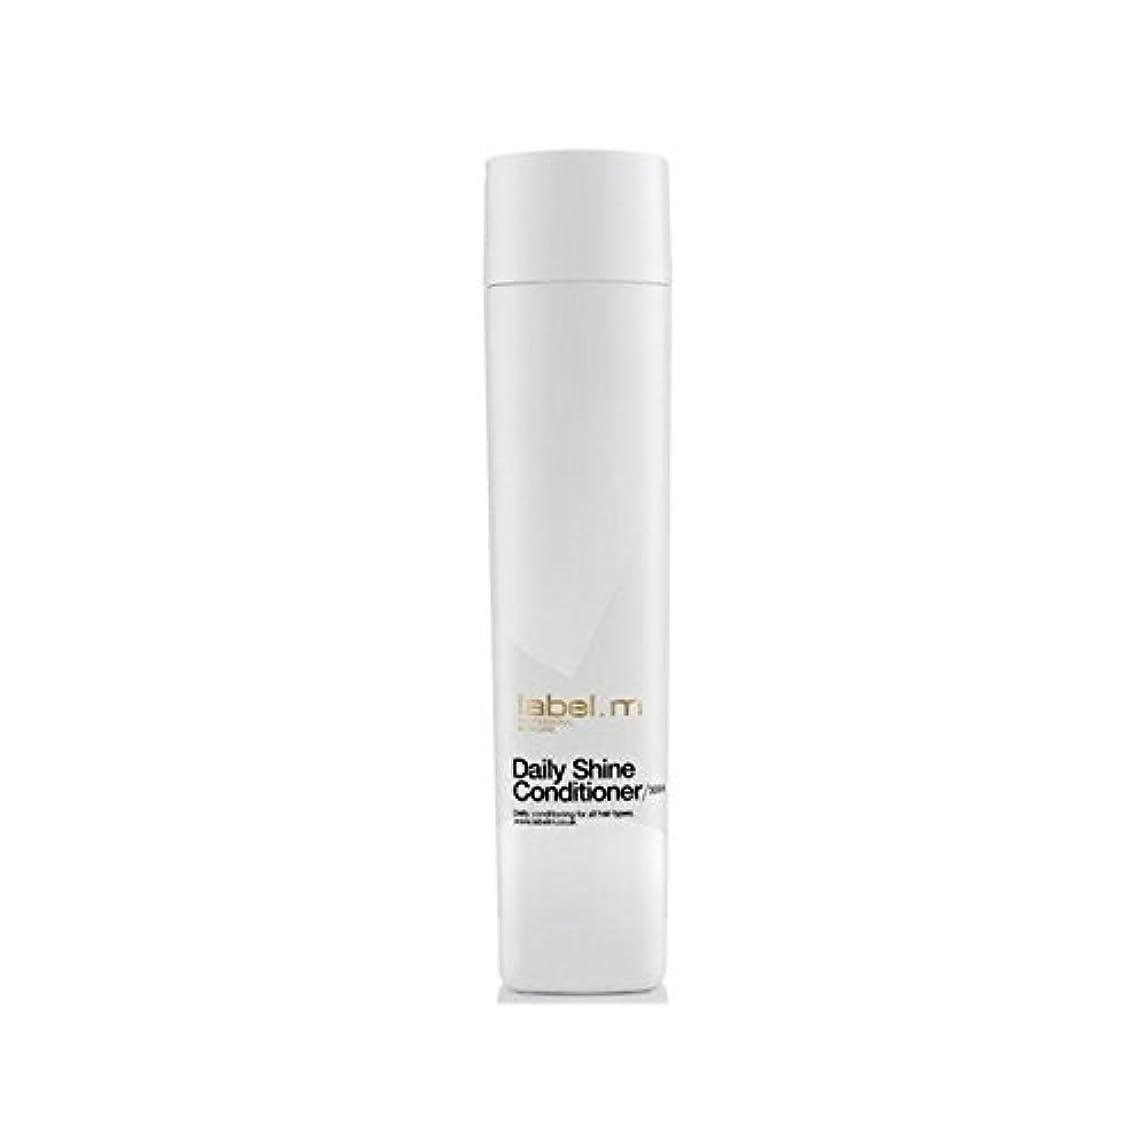 Label.M Daily Shine Conditioner (300ml) - .毎日シャインコンディショナー(300ミリリットル) [並行輸入品]